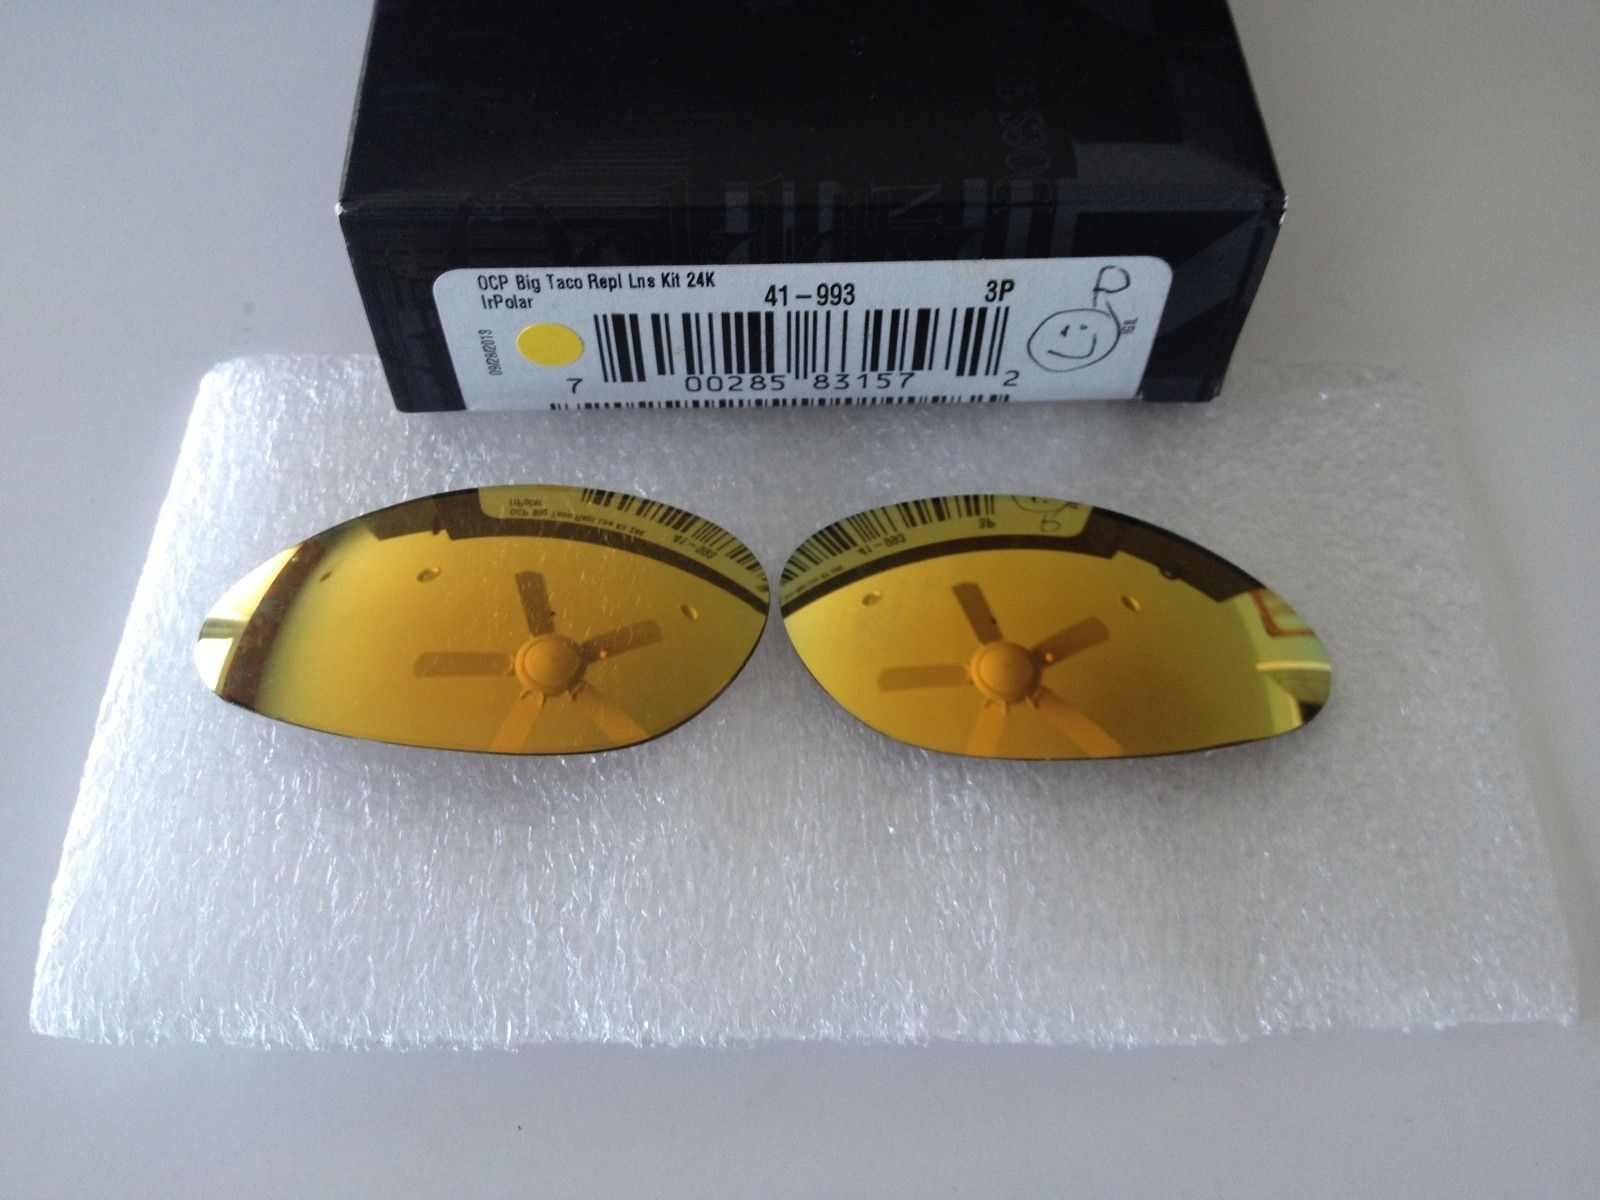 Custom Cut Penny BIP And 24k Polar X2 From Big Taco Lenses - IMG_5155.JPG